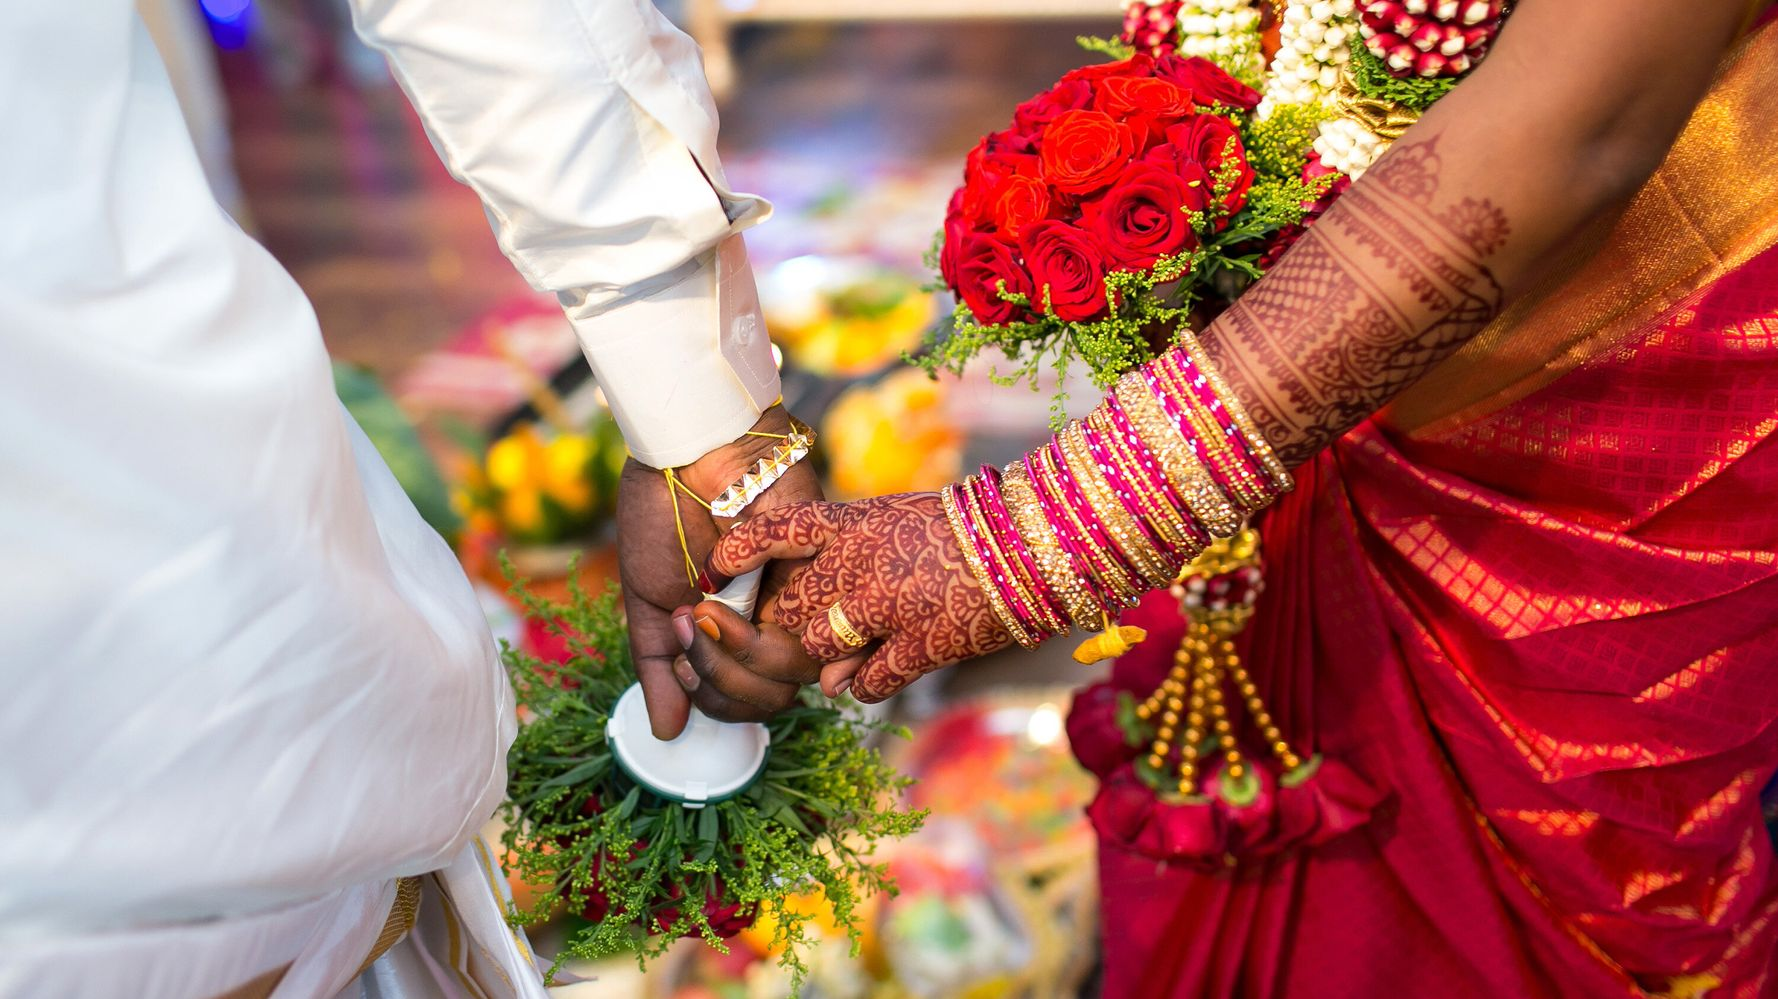 PunjabKesari, Chanakya Niti In Hindi, Chanakya Gyan, Chanakya Success Mantra In Hindi, चाणक्य नीति सूत्र, chankya niti about marriage